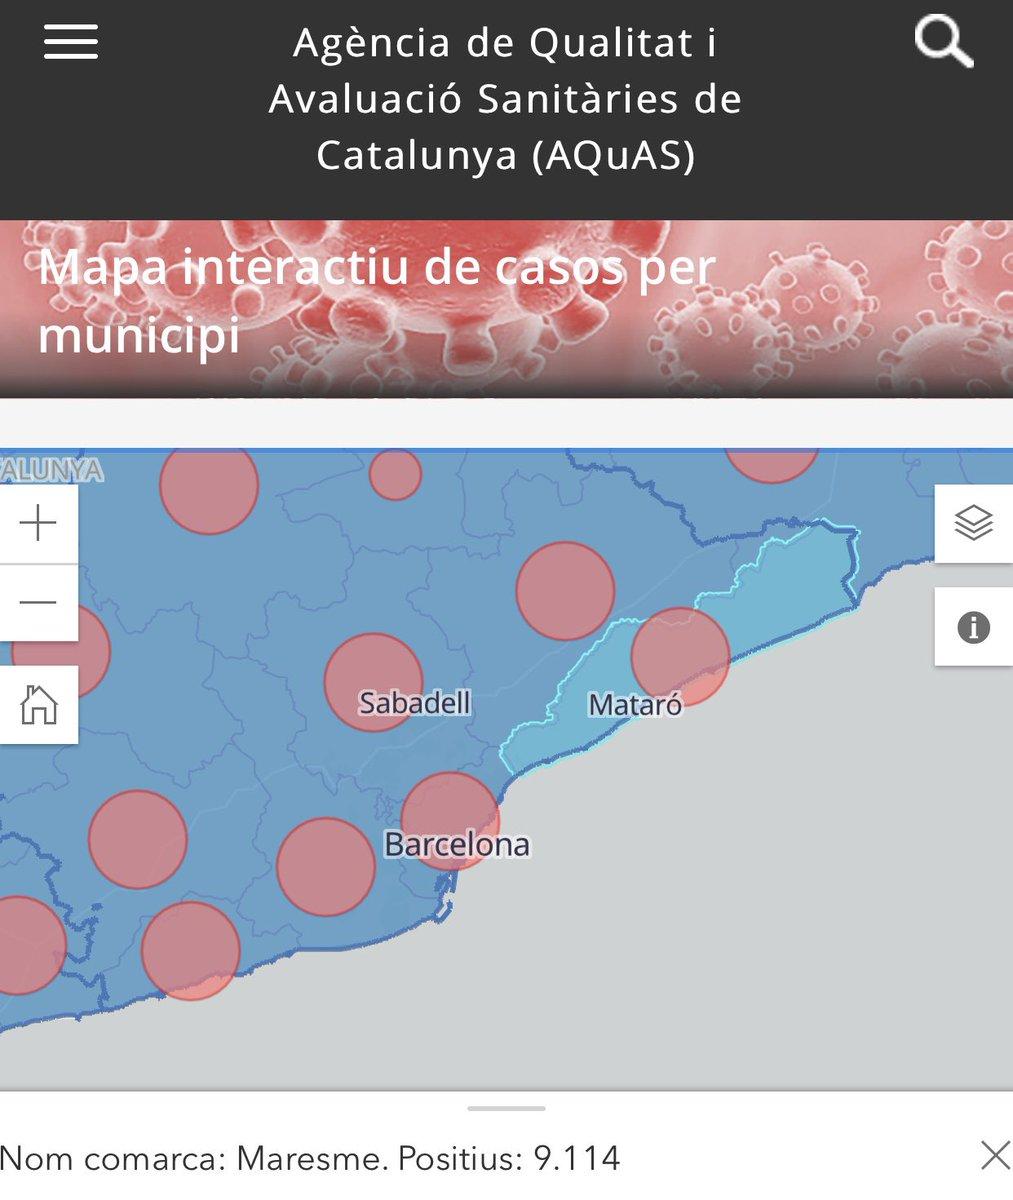 🦠DADES 20/10/2020. #Maresme : 9.114 📑 #Tiana : 227 #Alella 267 #Montgat 237  #ElMasnou 412 #covidMaresme  #Badalona 6.565 https://t.co/K6G2CBU4E2… https://t.co/wIfitFm5mb